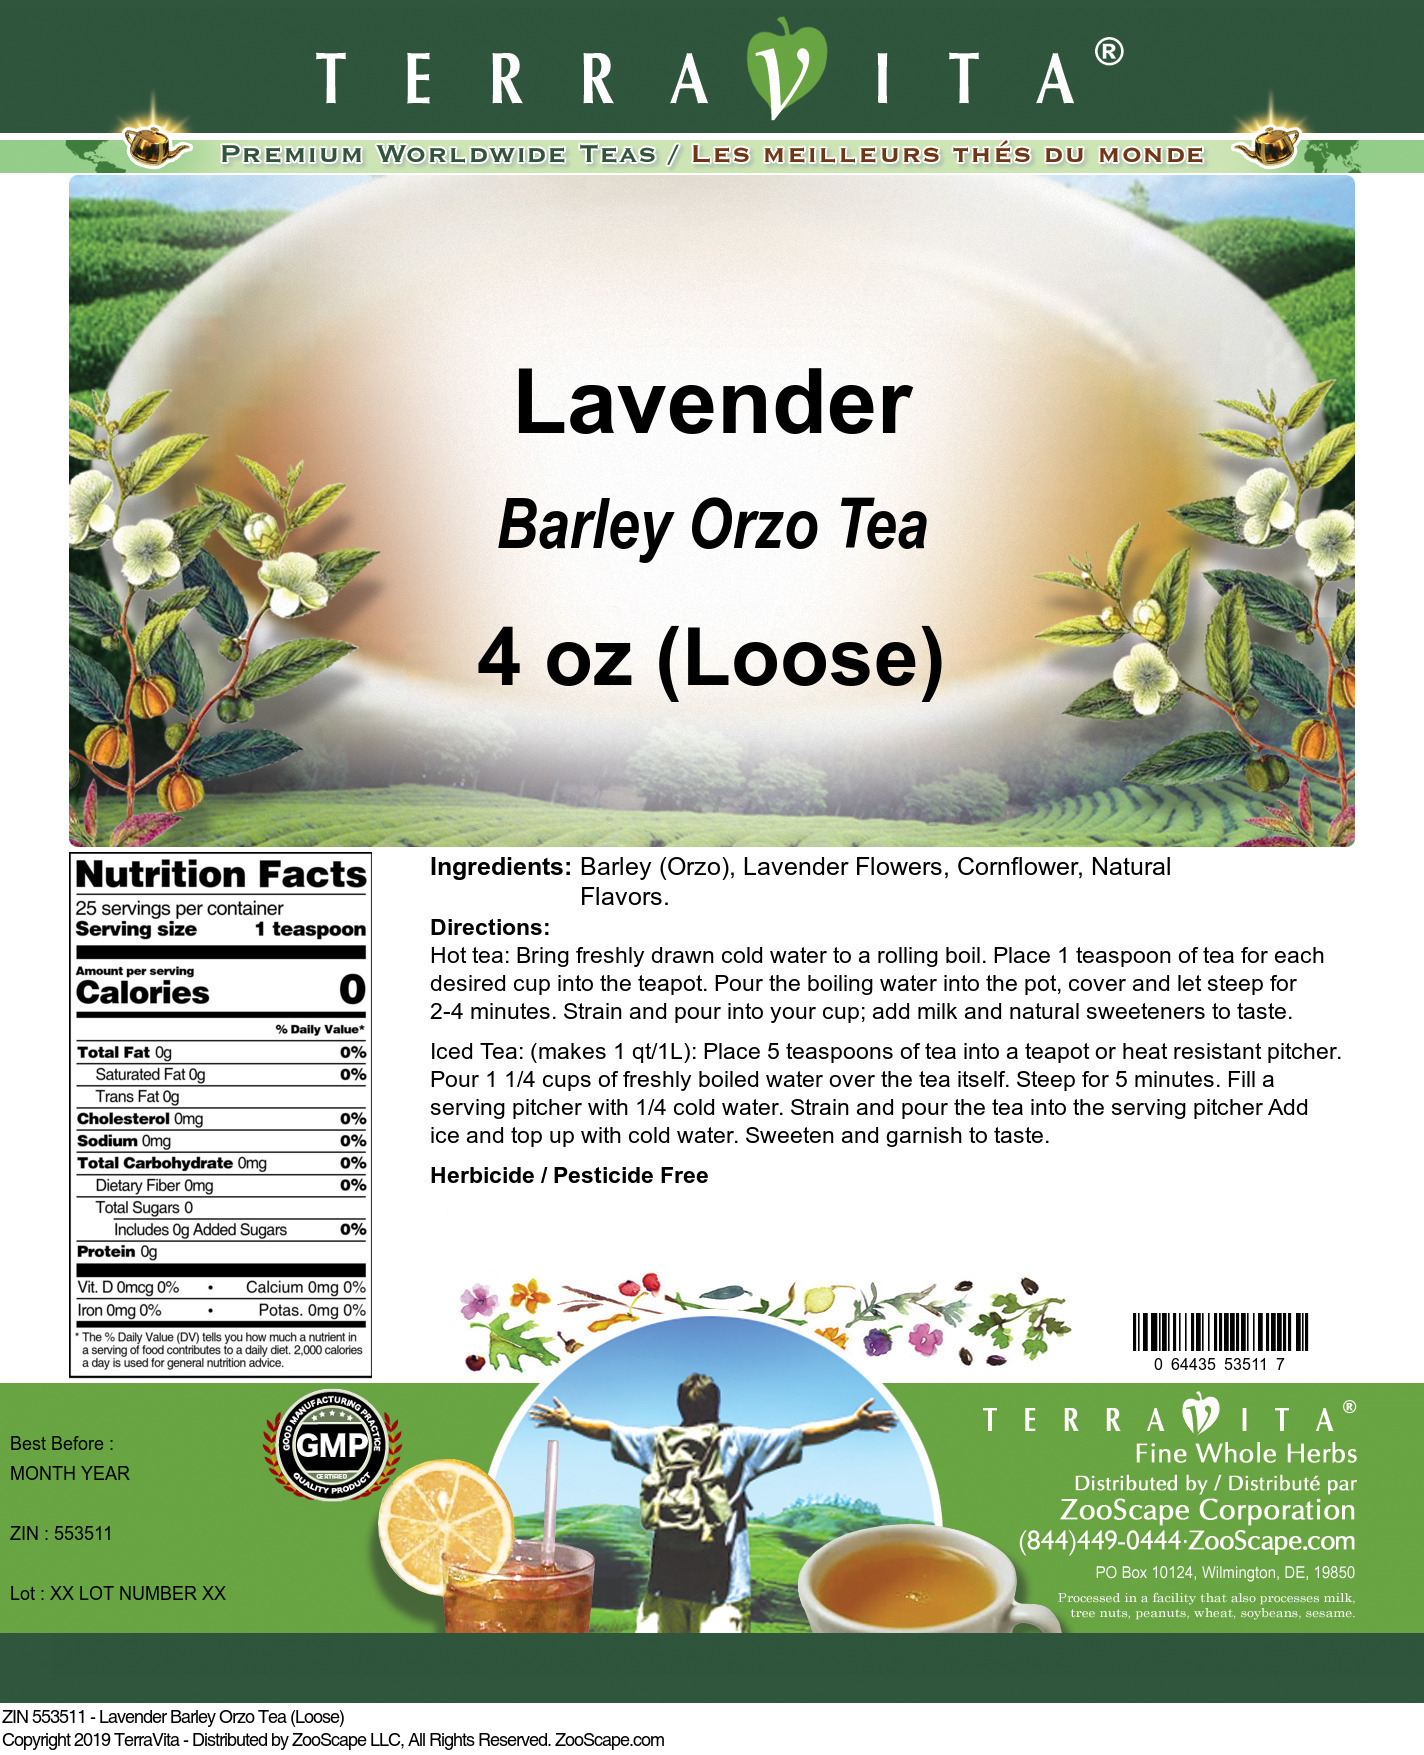 Lavender Barley Orzo